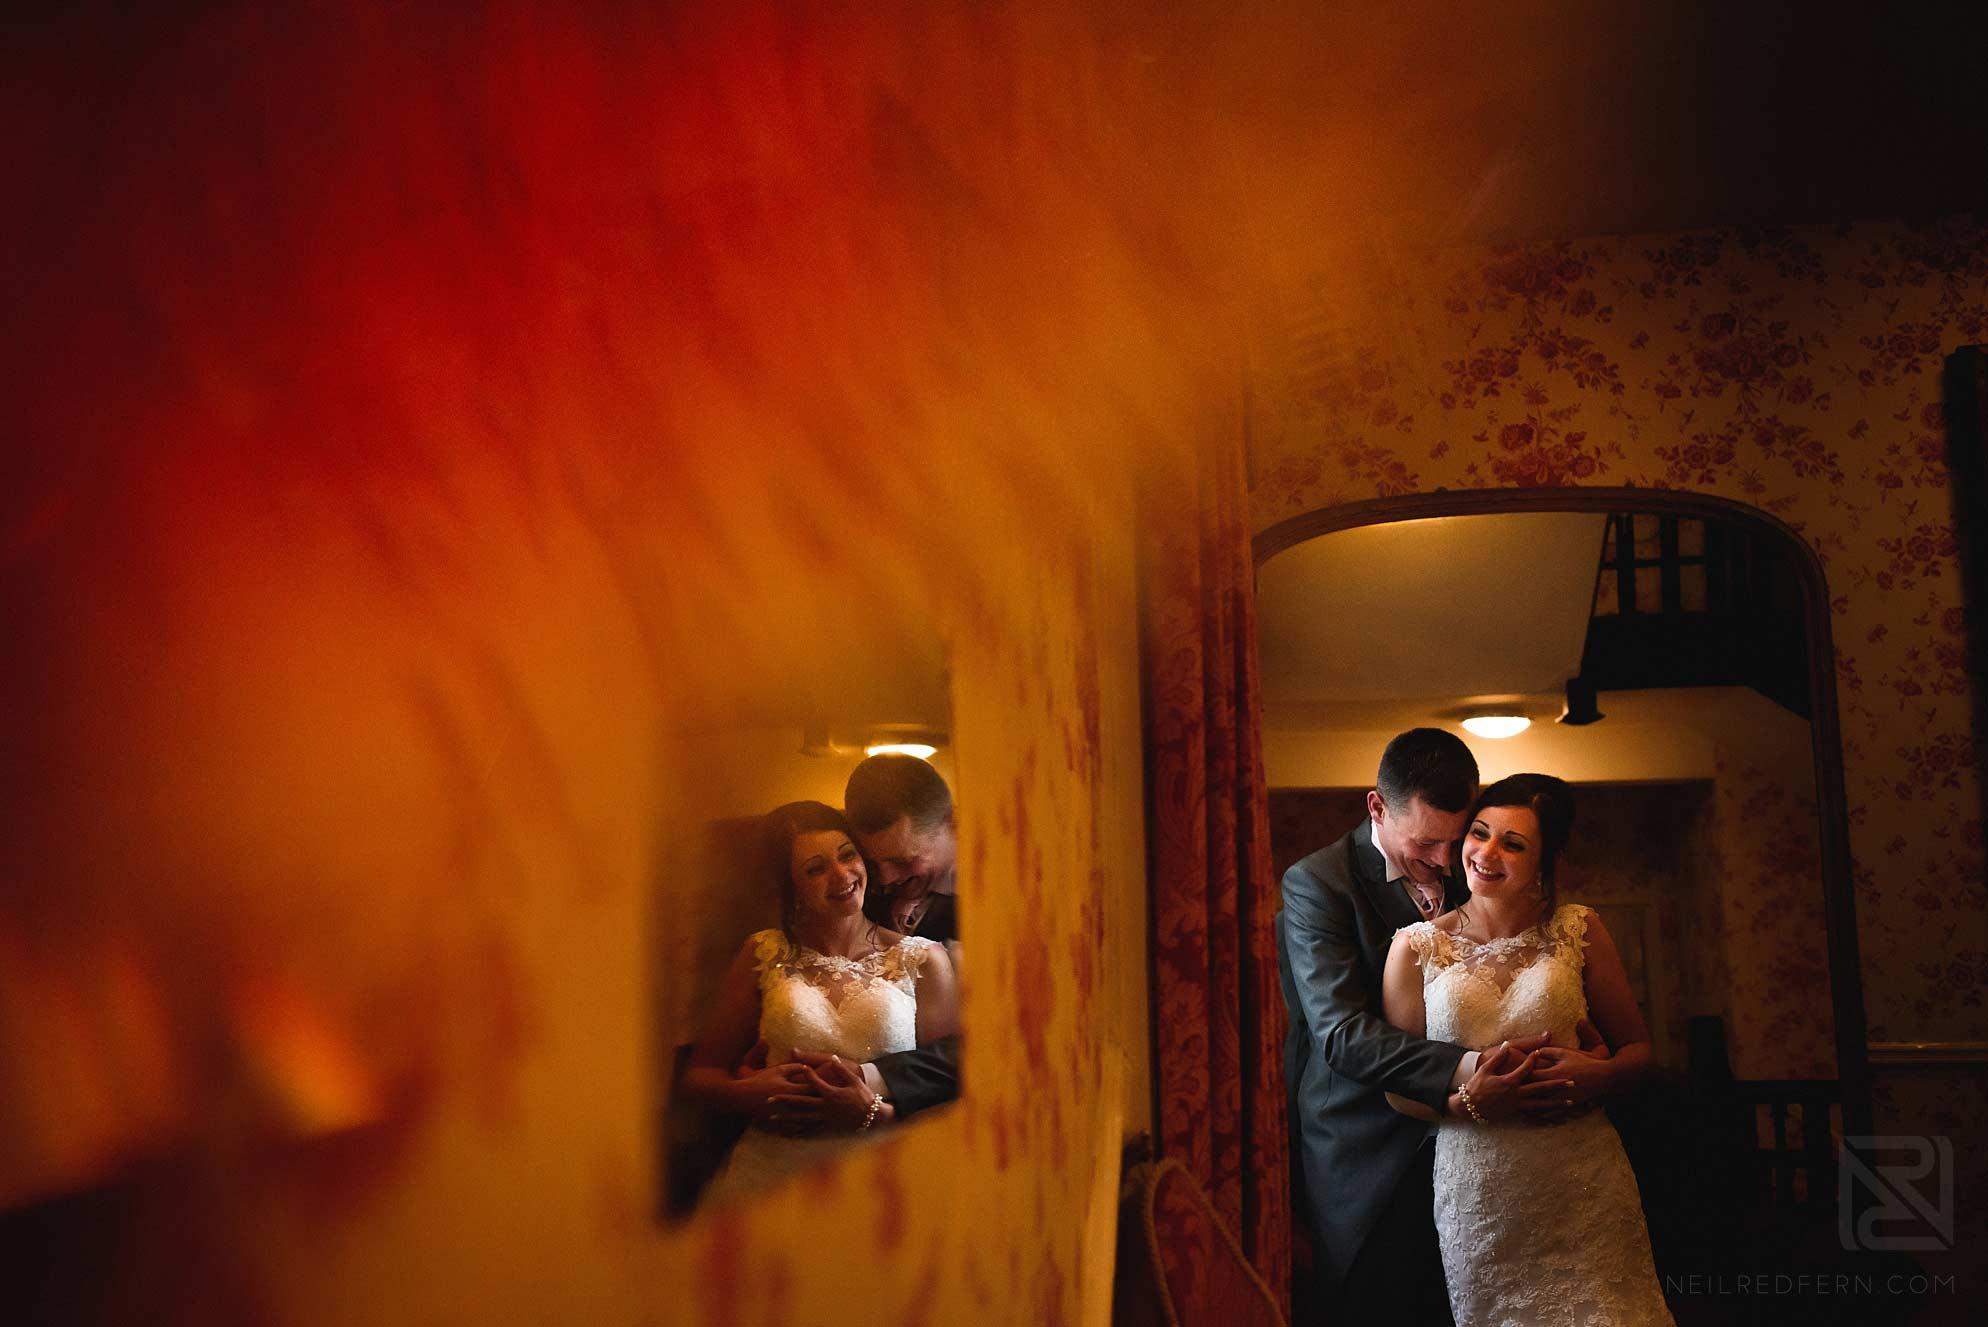 Metropole-Hotel-Llandrindod-Wells-wedding-31